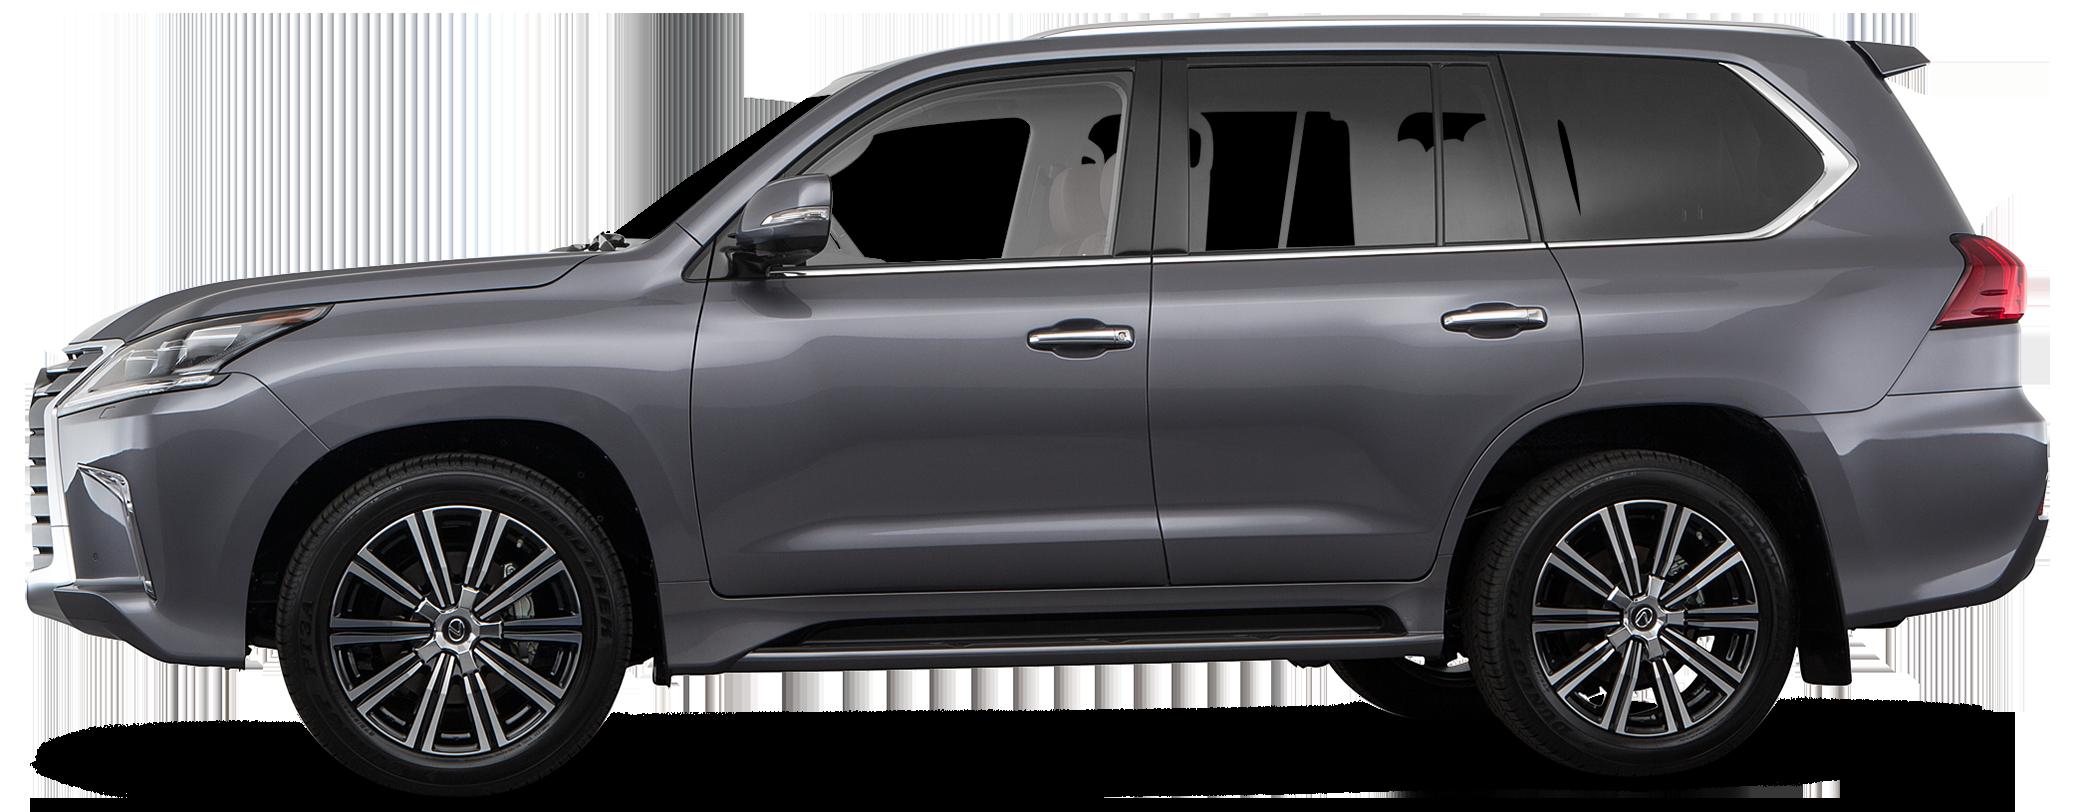 2019 Lexus Lx 570 Msrp